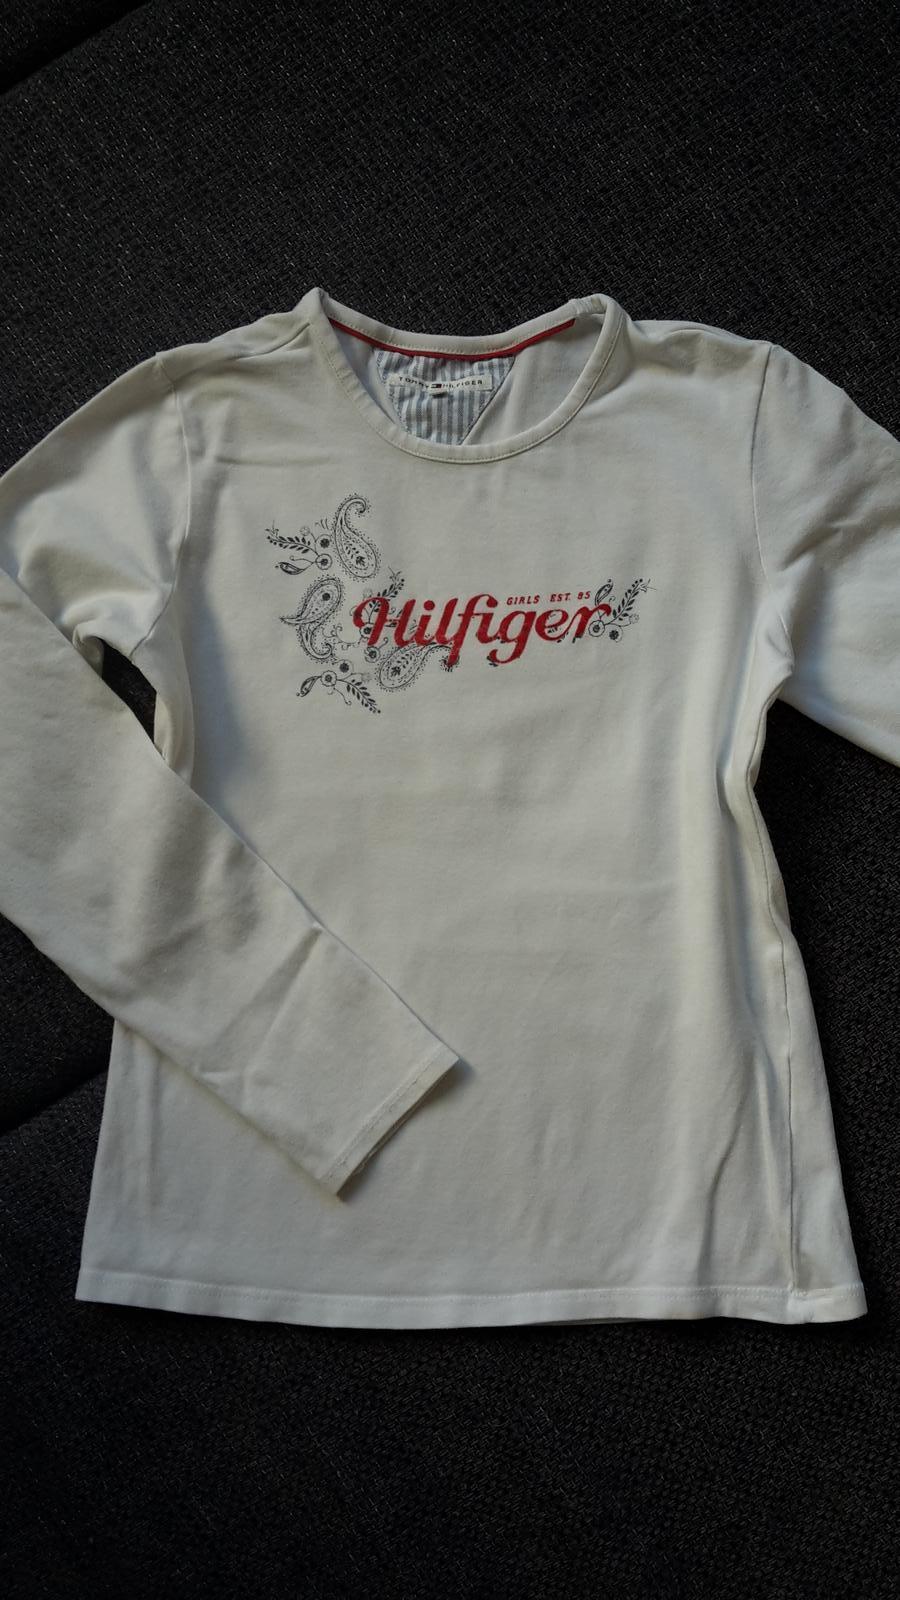 034a6d13afa8 Pekné tričko